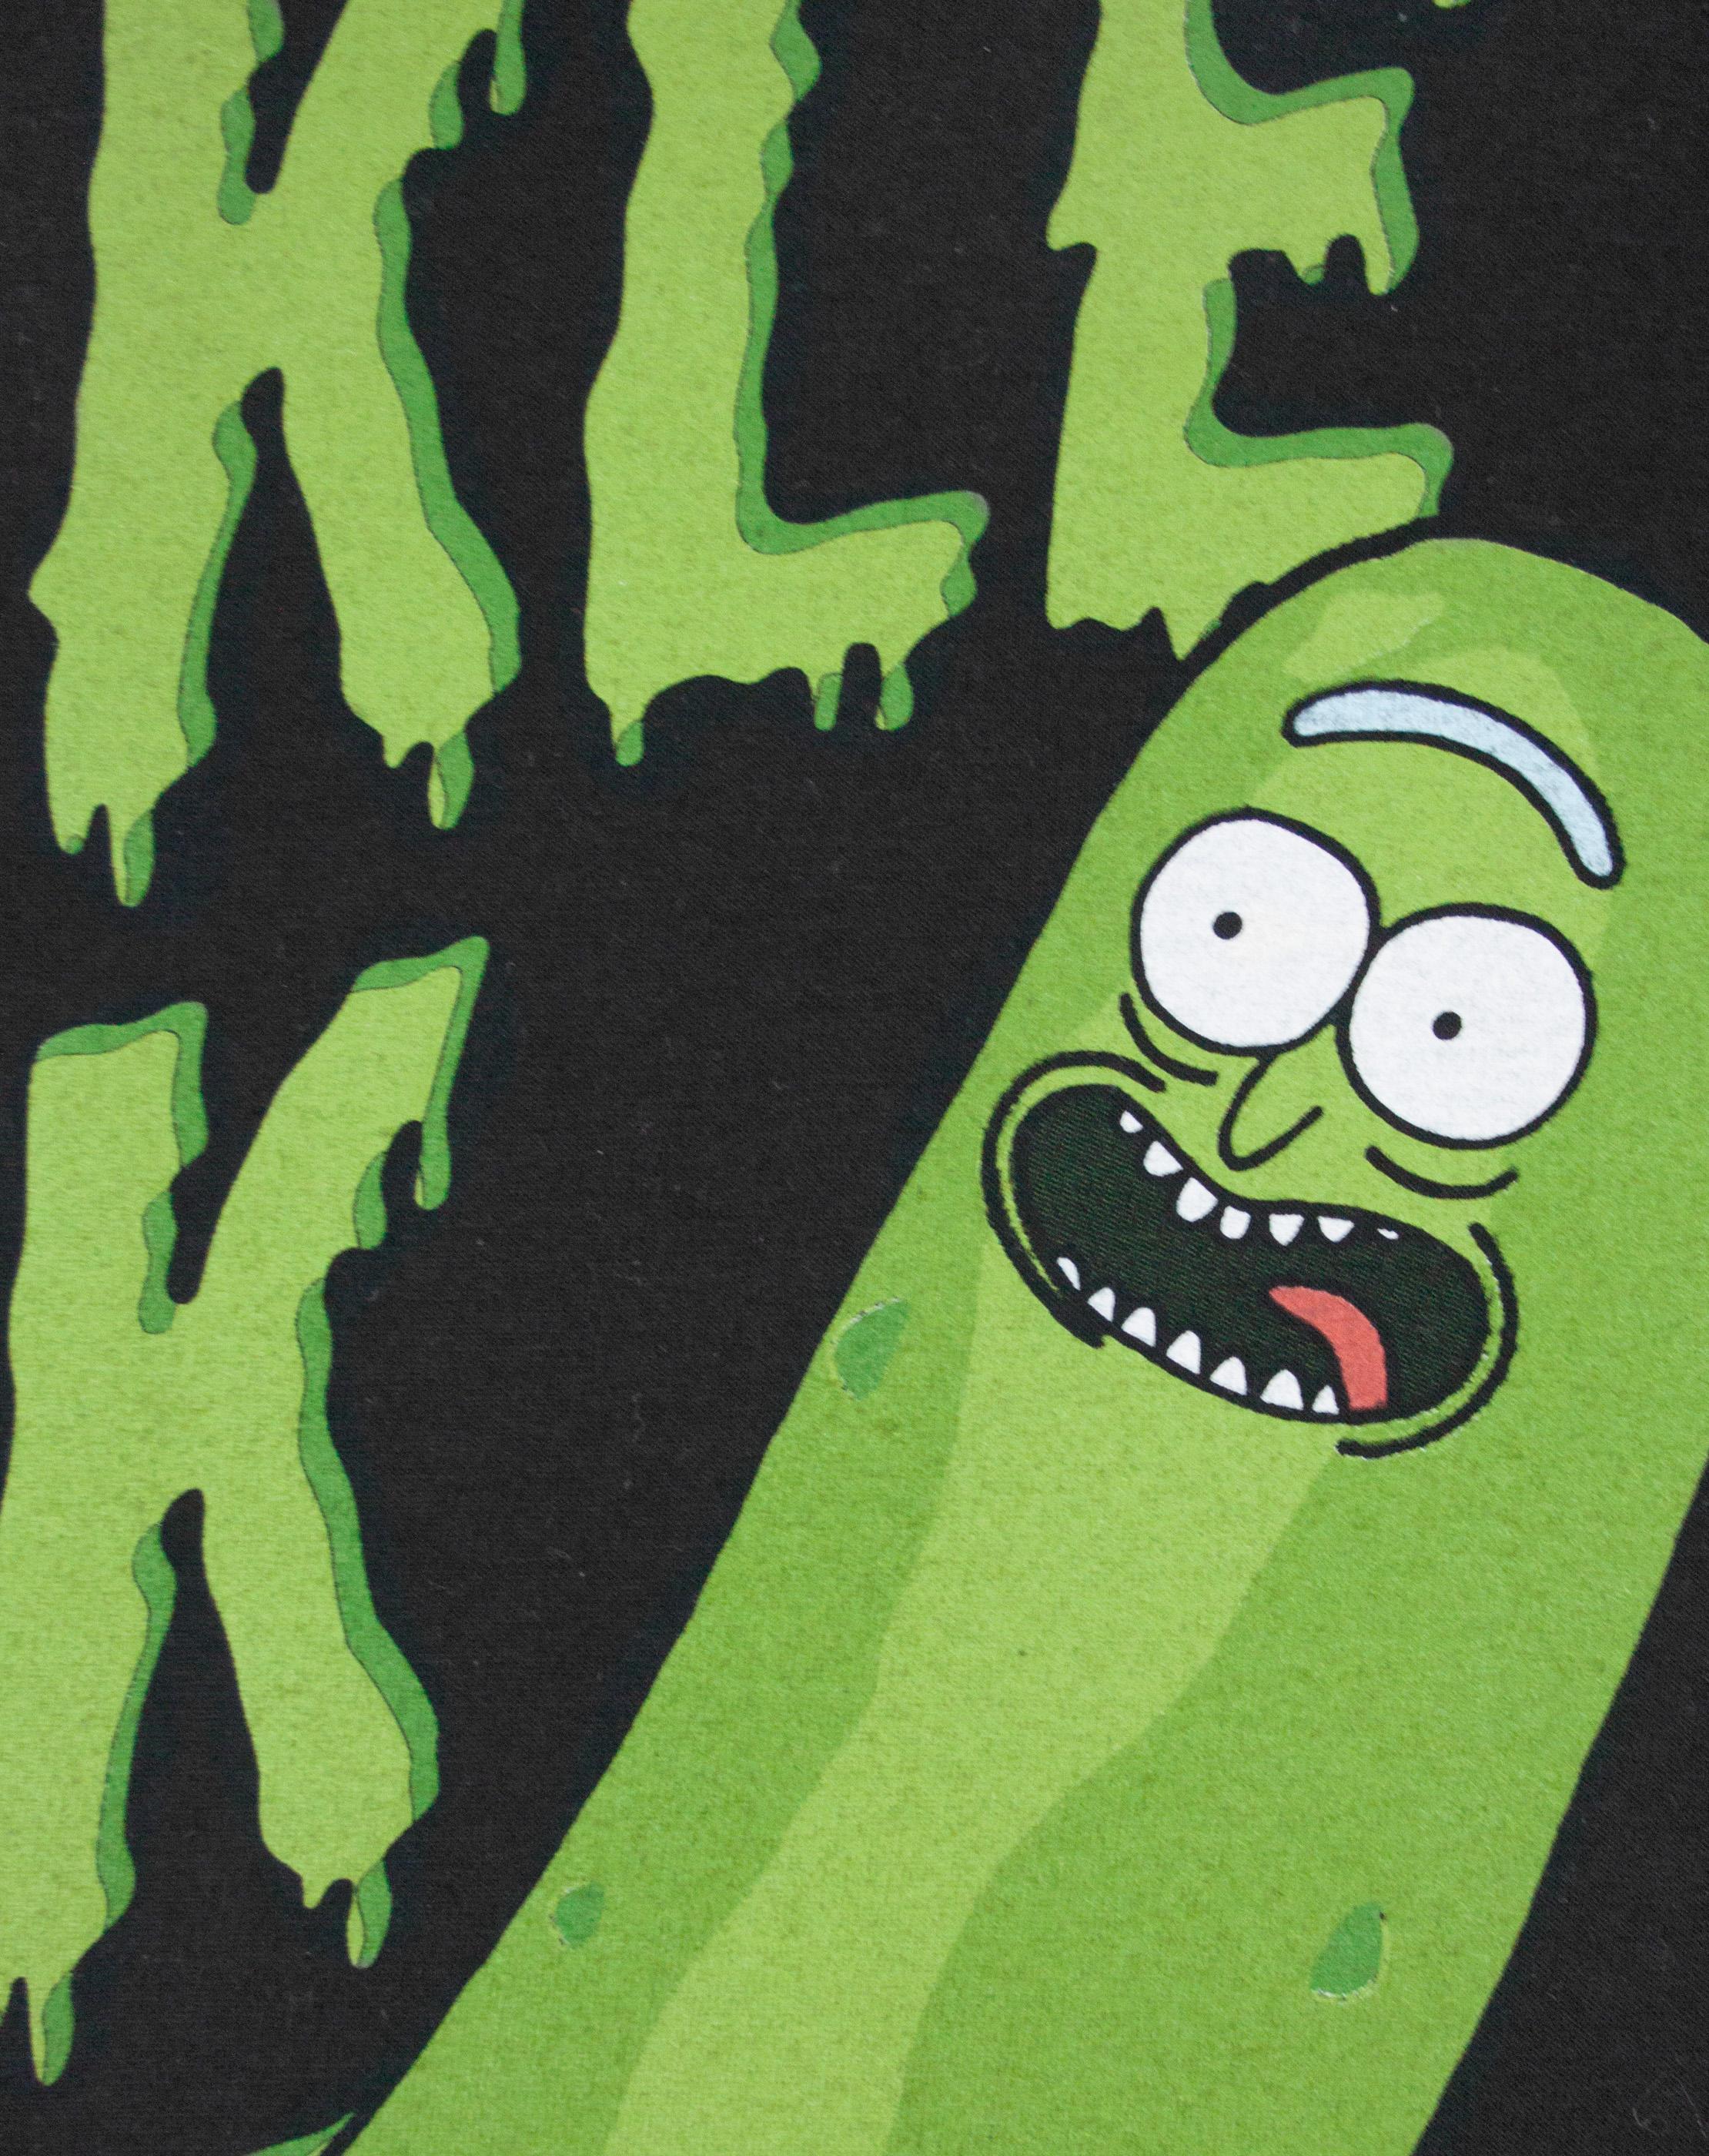 thumbnail 11 - Rick And Morty T-Shirt I'm Pickle Rick Men's Black Short Sleeved Tee